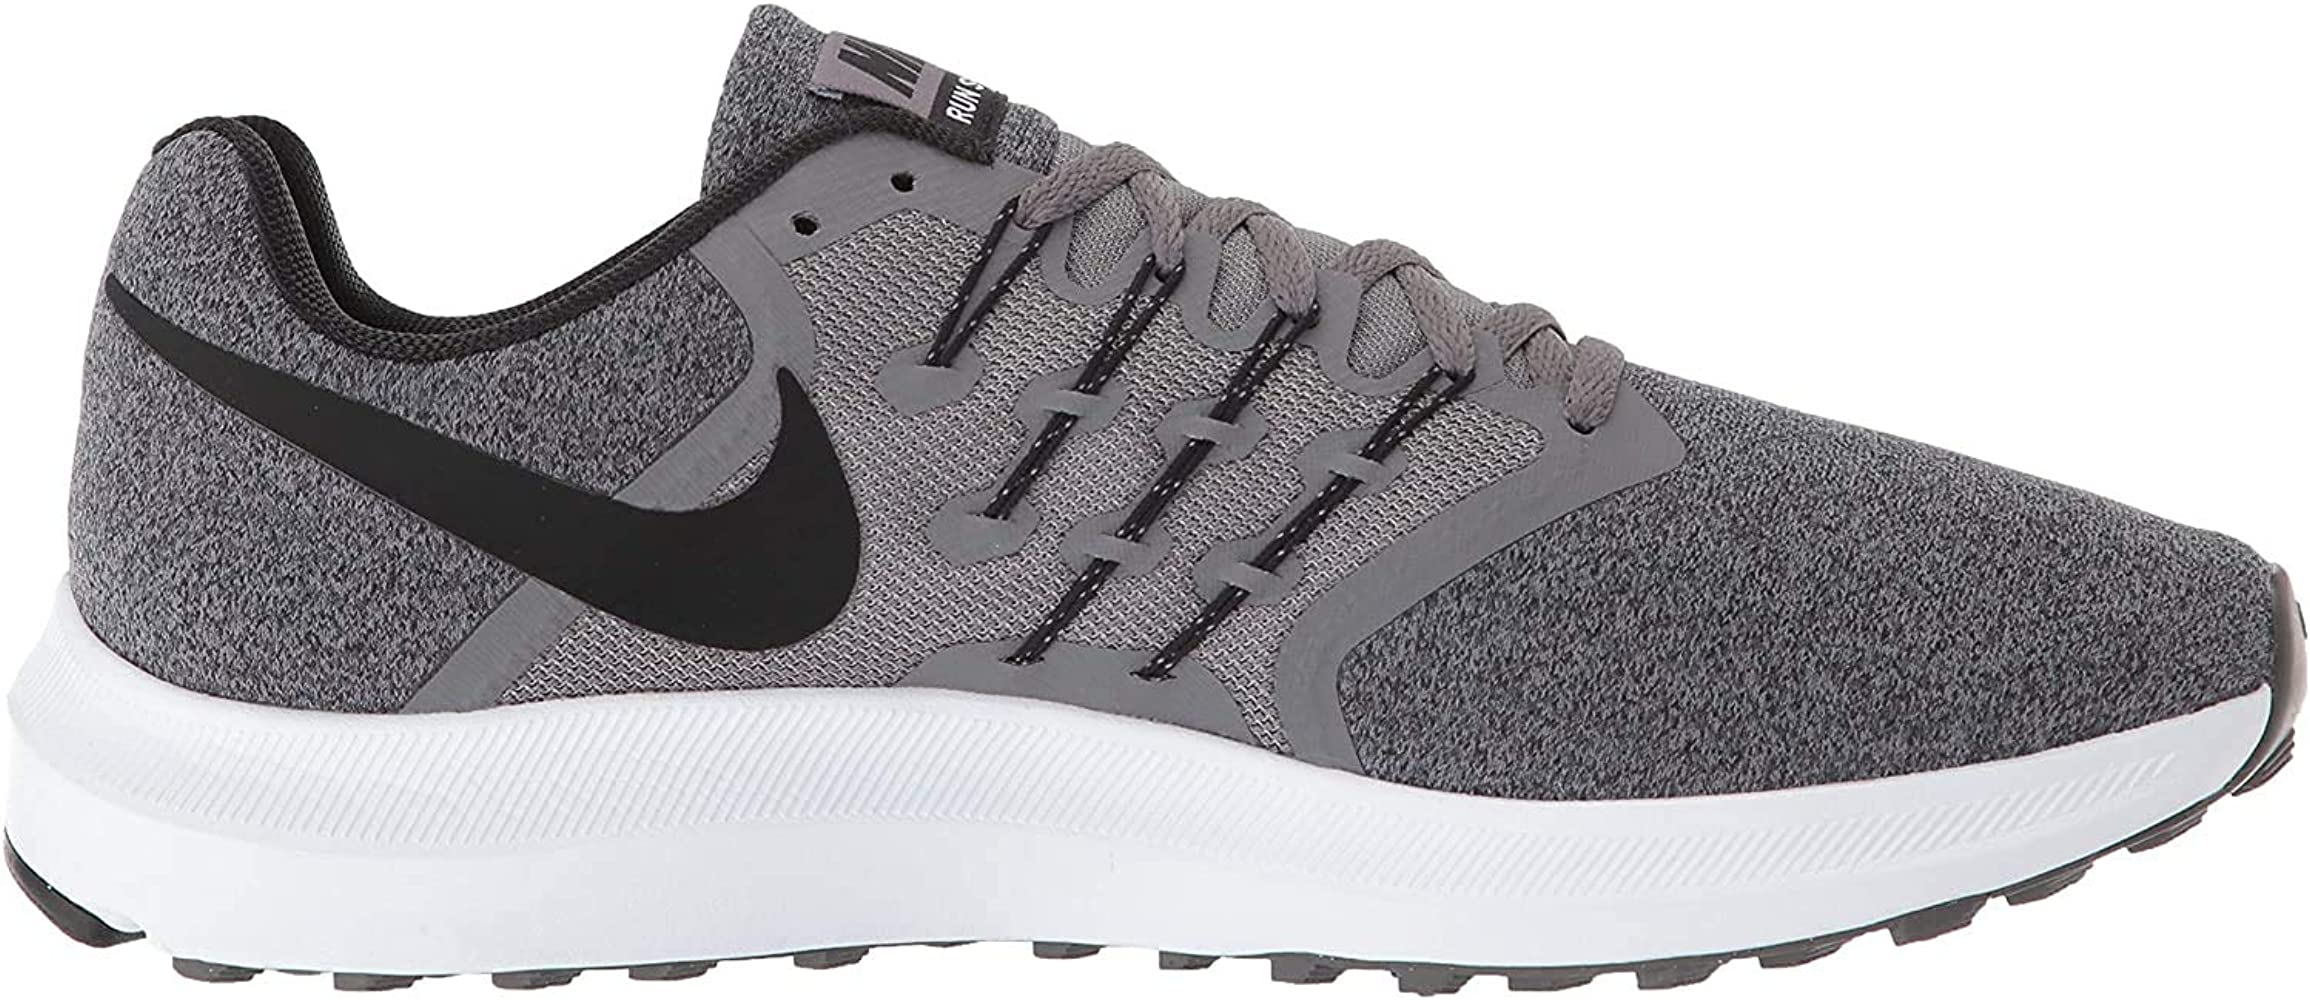 Nike Run Swift - Zapatillas de Deporte para Hombre, Color Gris ...